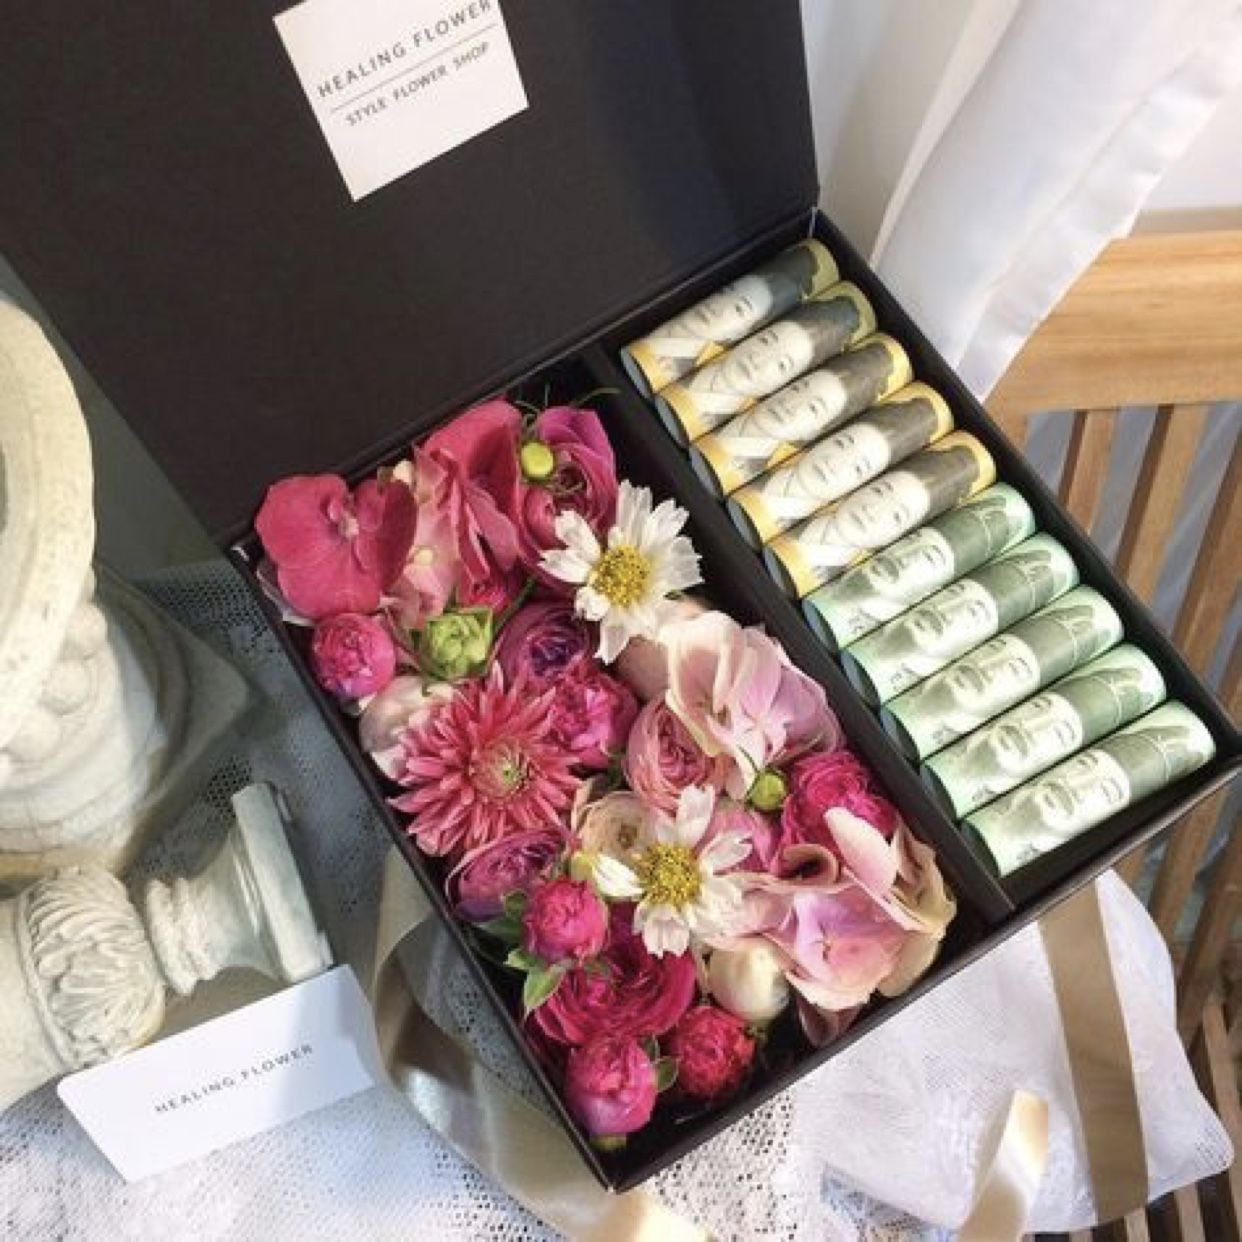 Pin By Marwa On هدايا Wedding Gift Money Creative Money Gifts Flower Box Gift